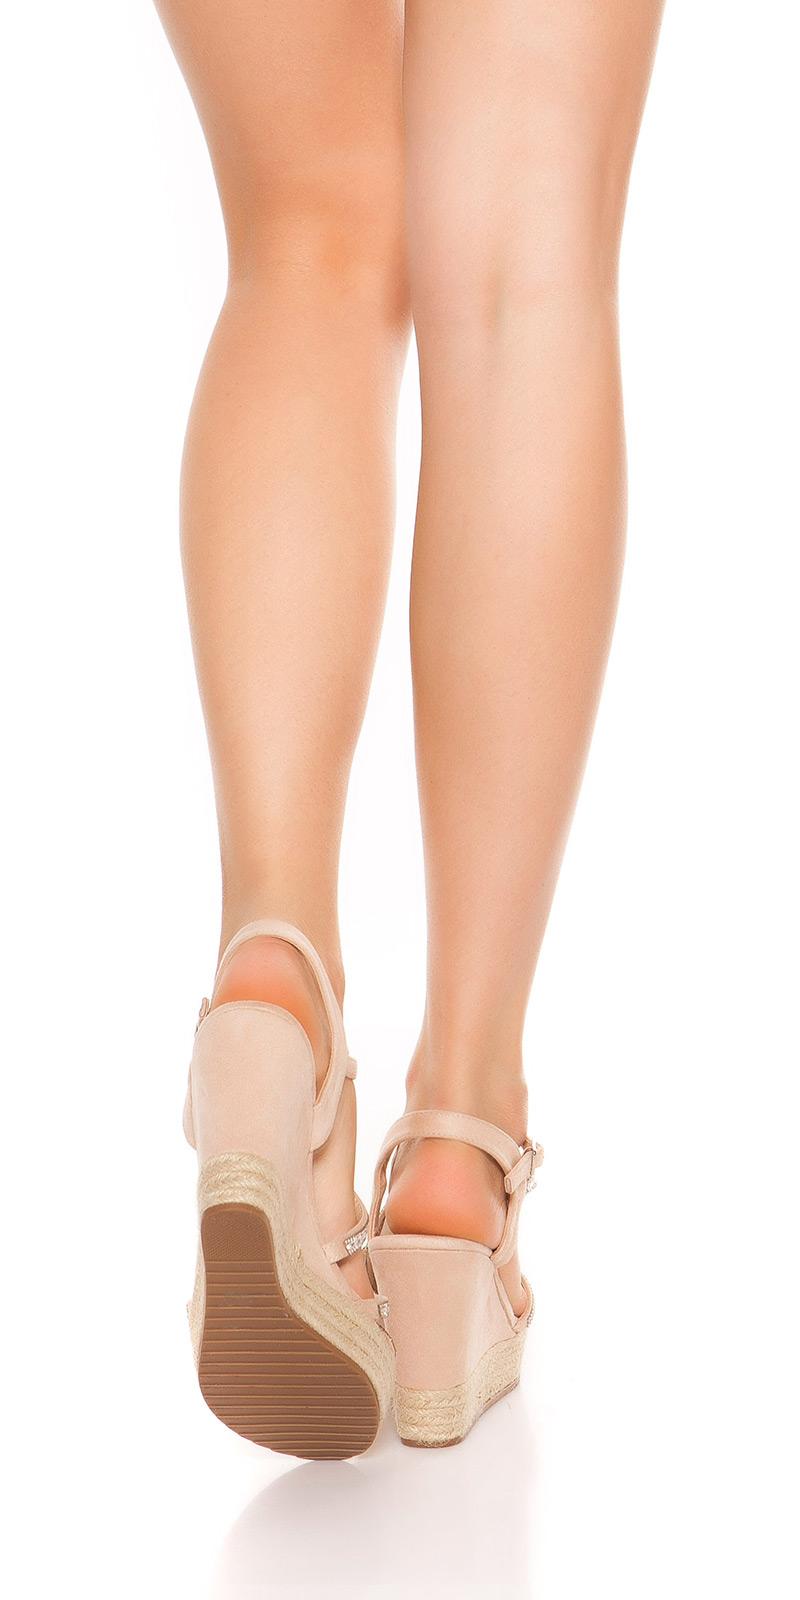 Sandale Sexy cu platforma heel cu strasuri